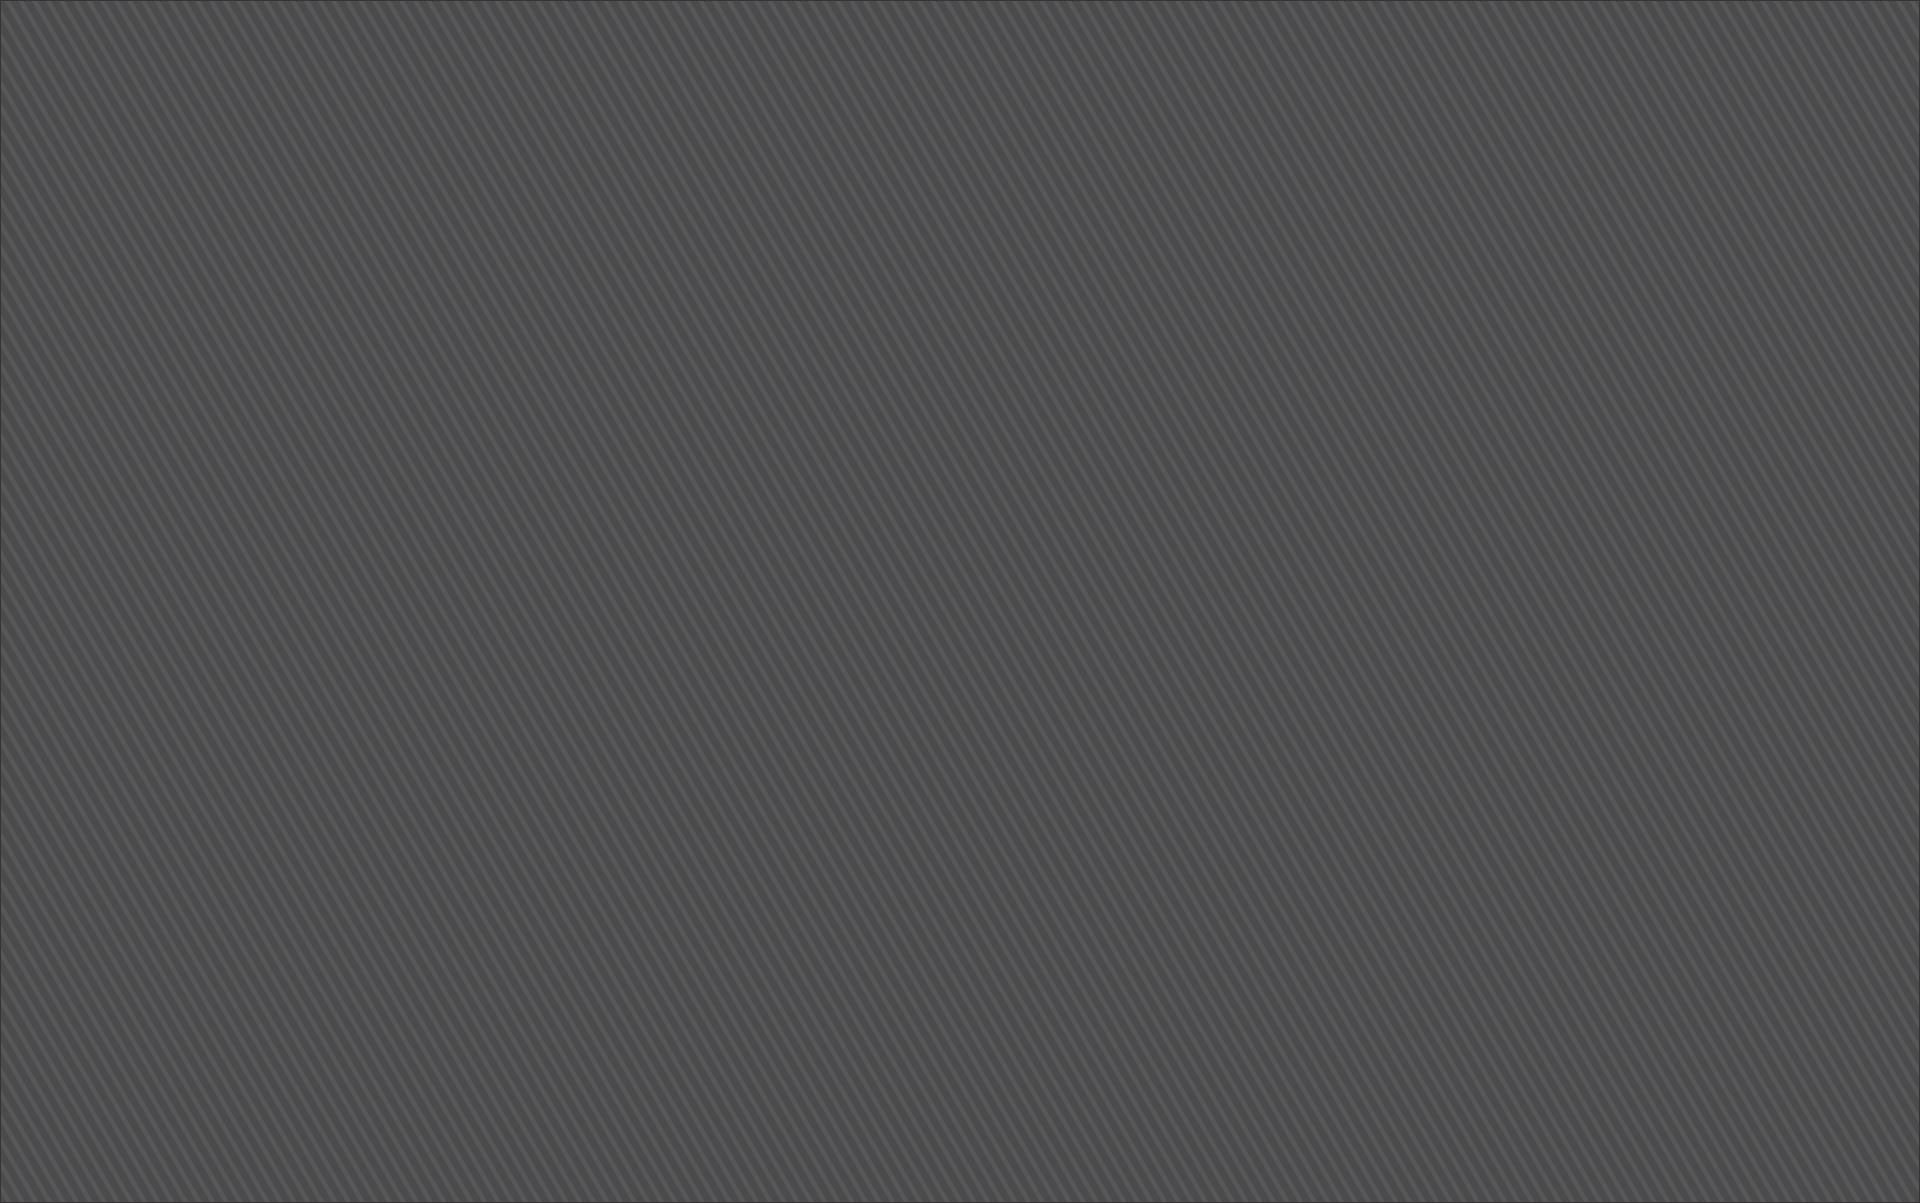 le-plymouth-theme/pacote/lib/plymouth/themes/le-logo/le-background-w.png